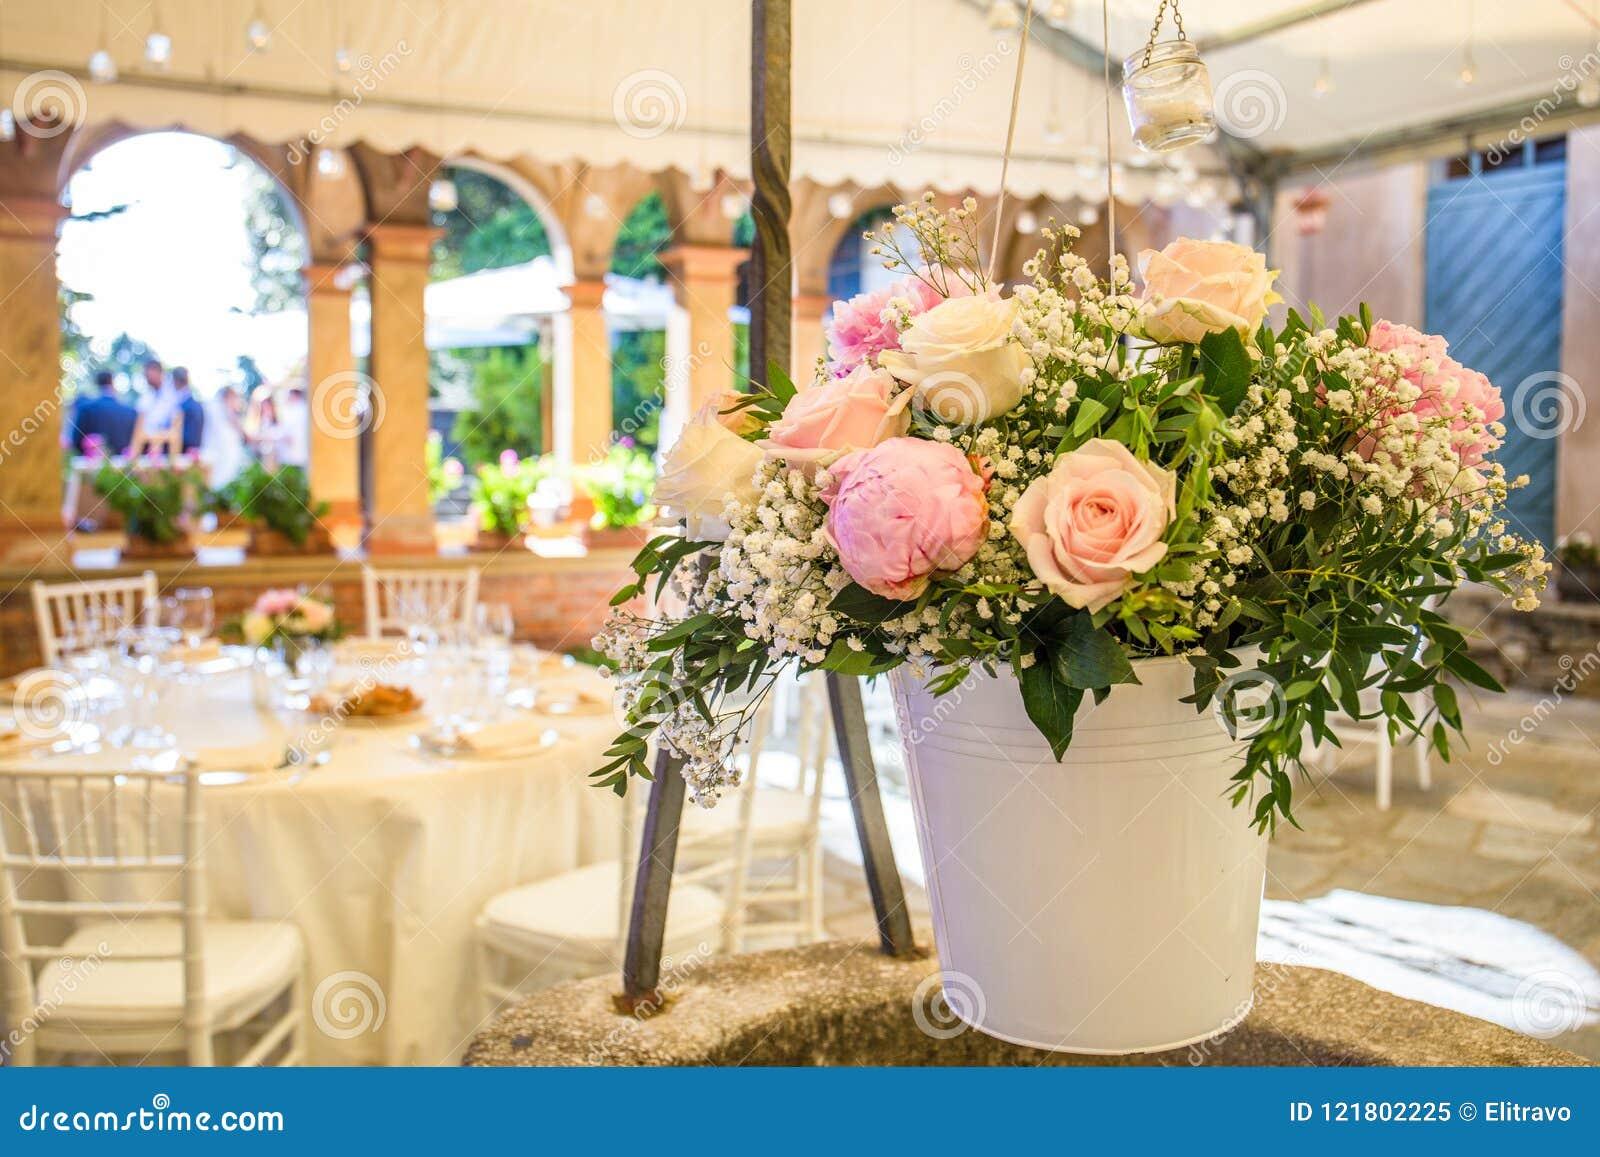 Beautiful Wedding Reception Outdoor In The Garden Stock Image